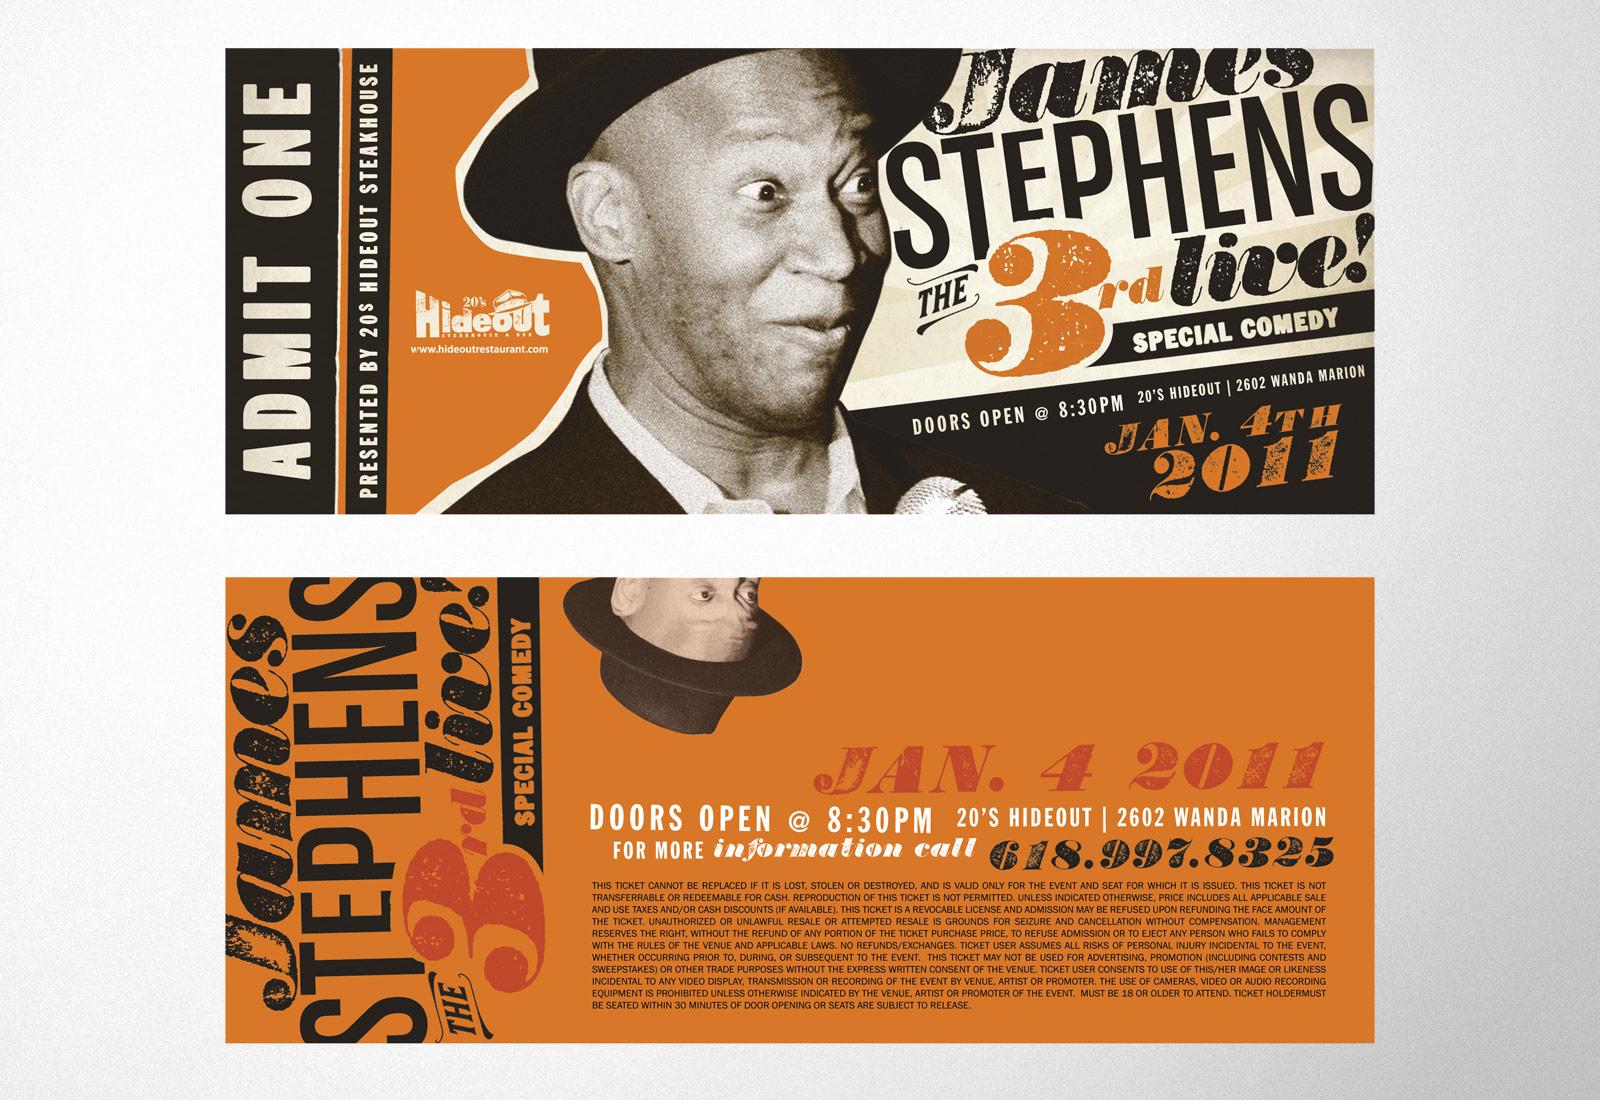 Hideout Steakhouse James Stephens III